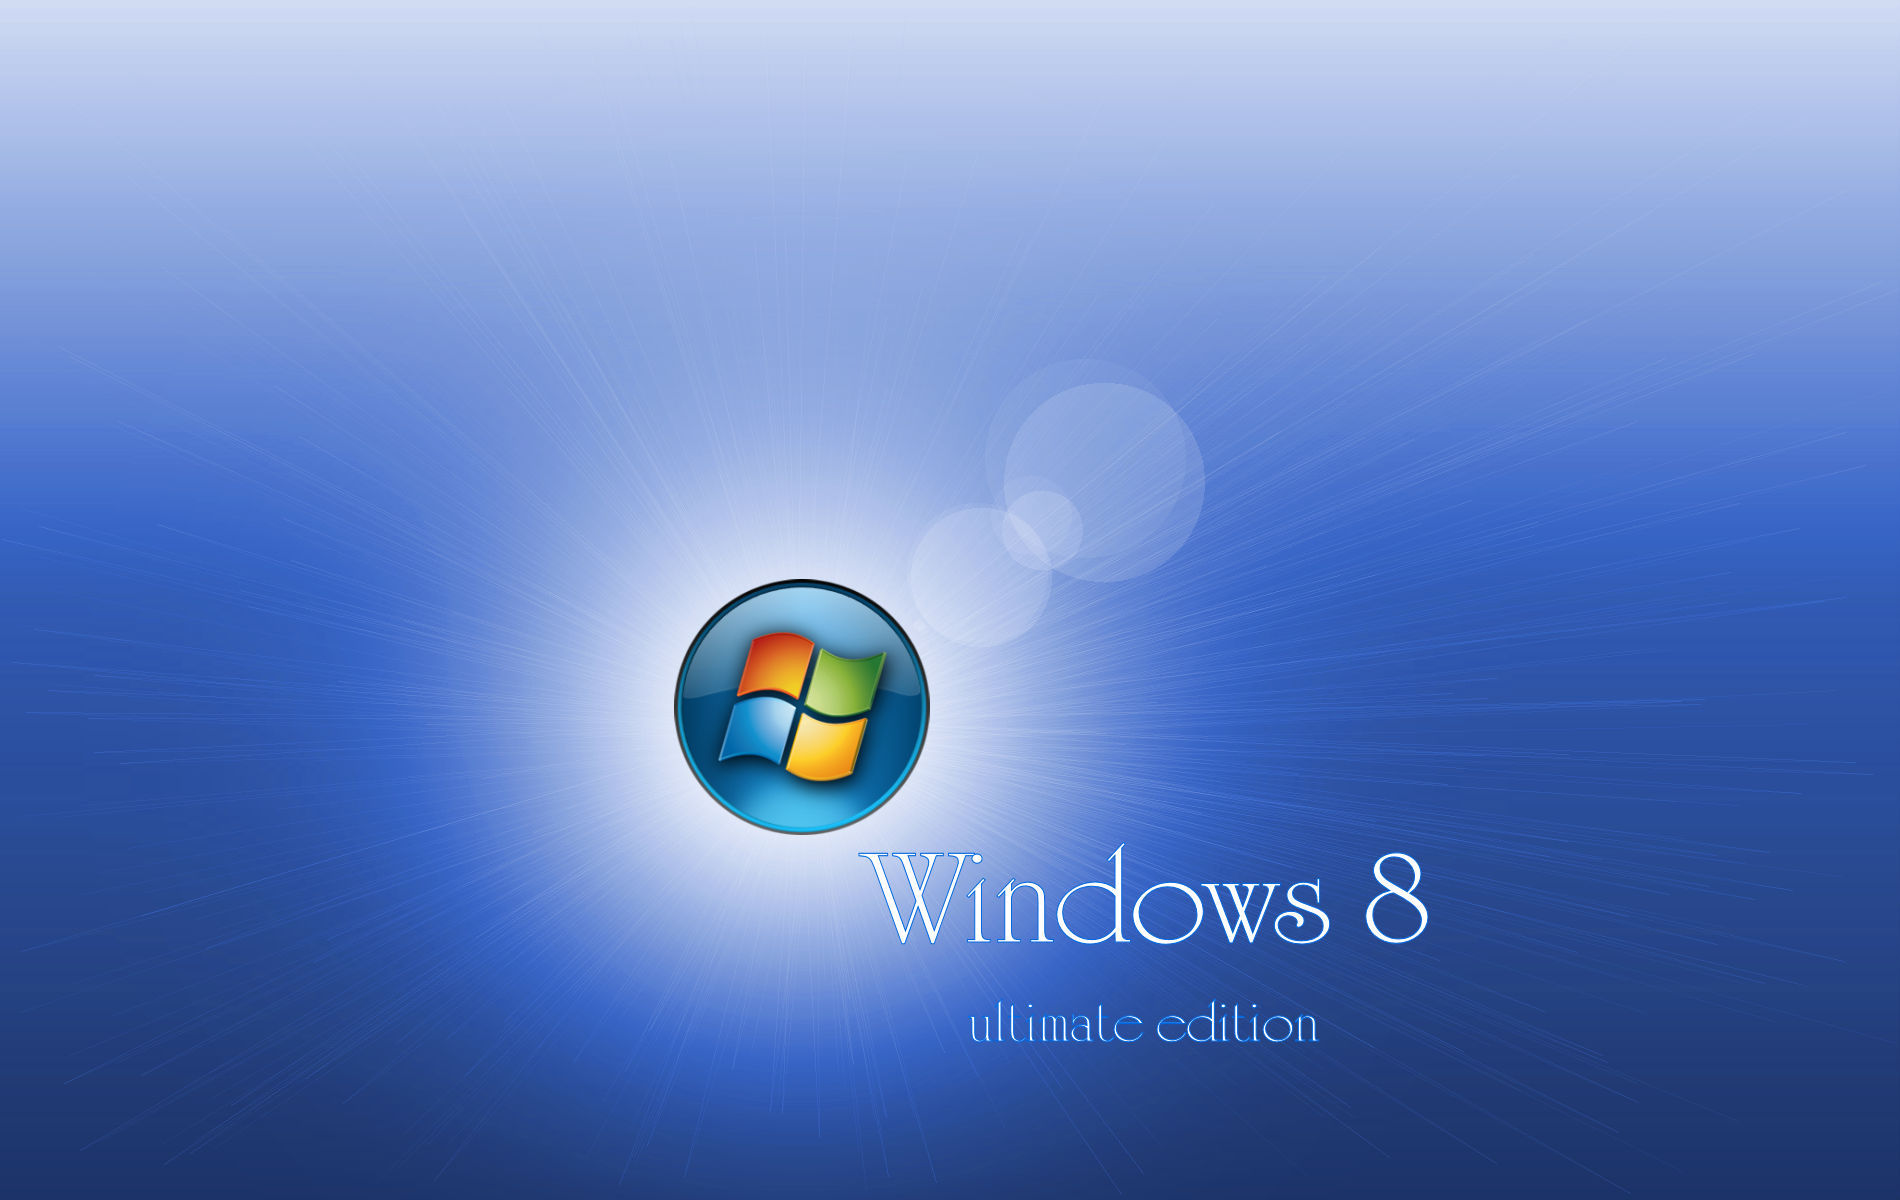 Wallpapers Windows 8  MaximumWallHD